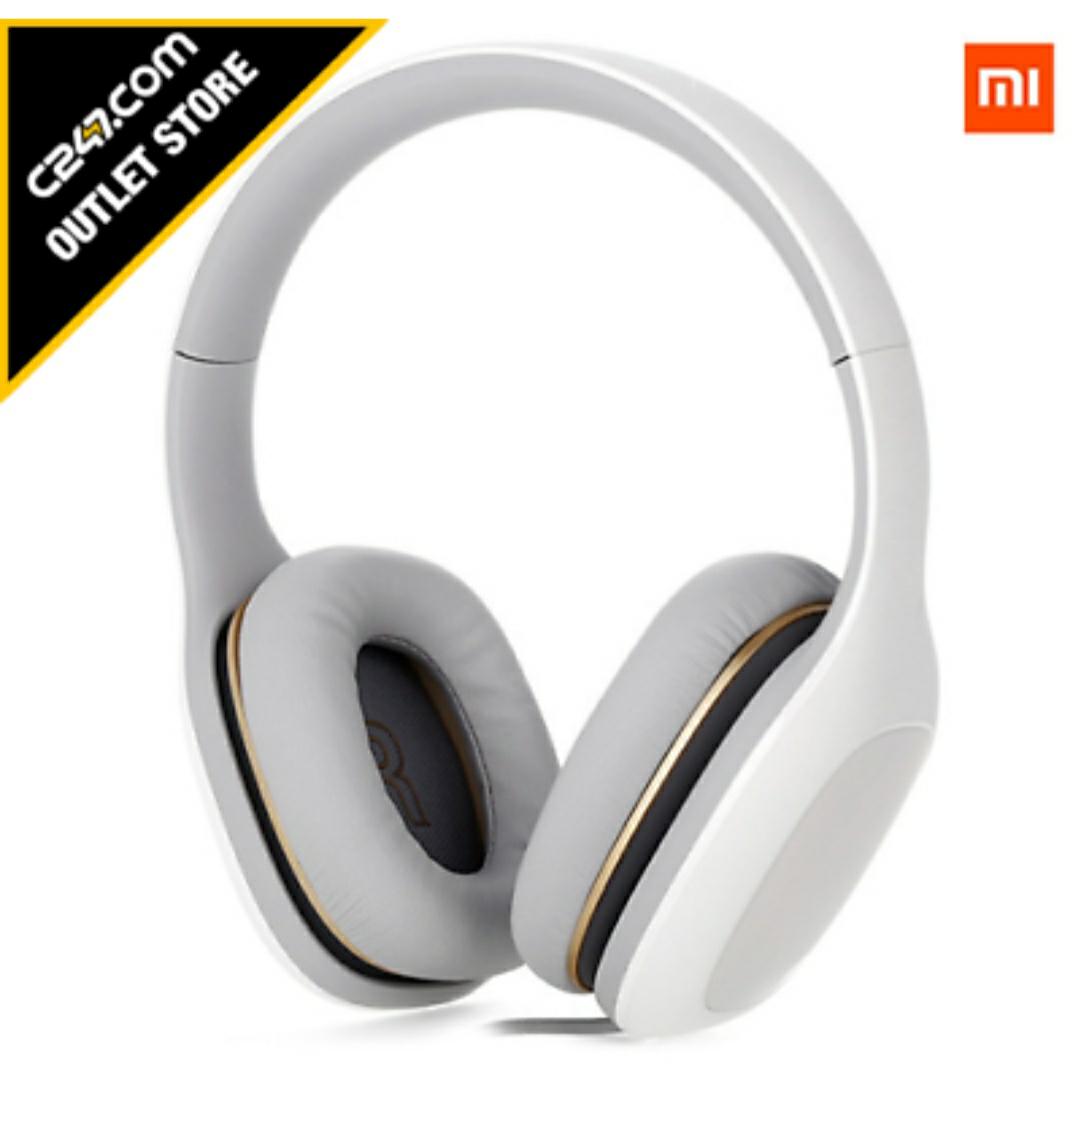 XIAOMI MI COMFORT - WHITE - ON EAR HEADPHONES - New £14.47 @ CF247 Ebay Store